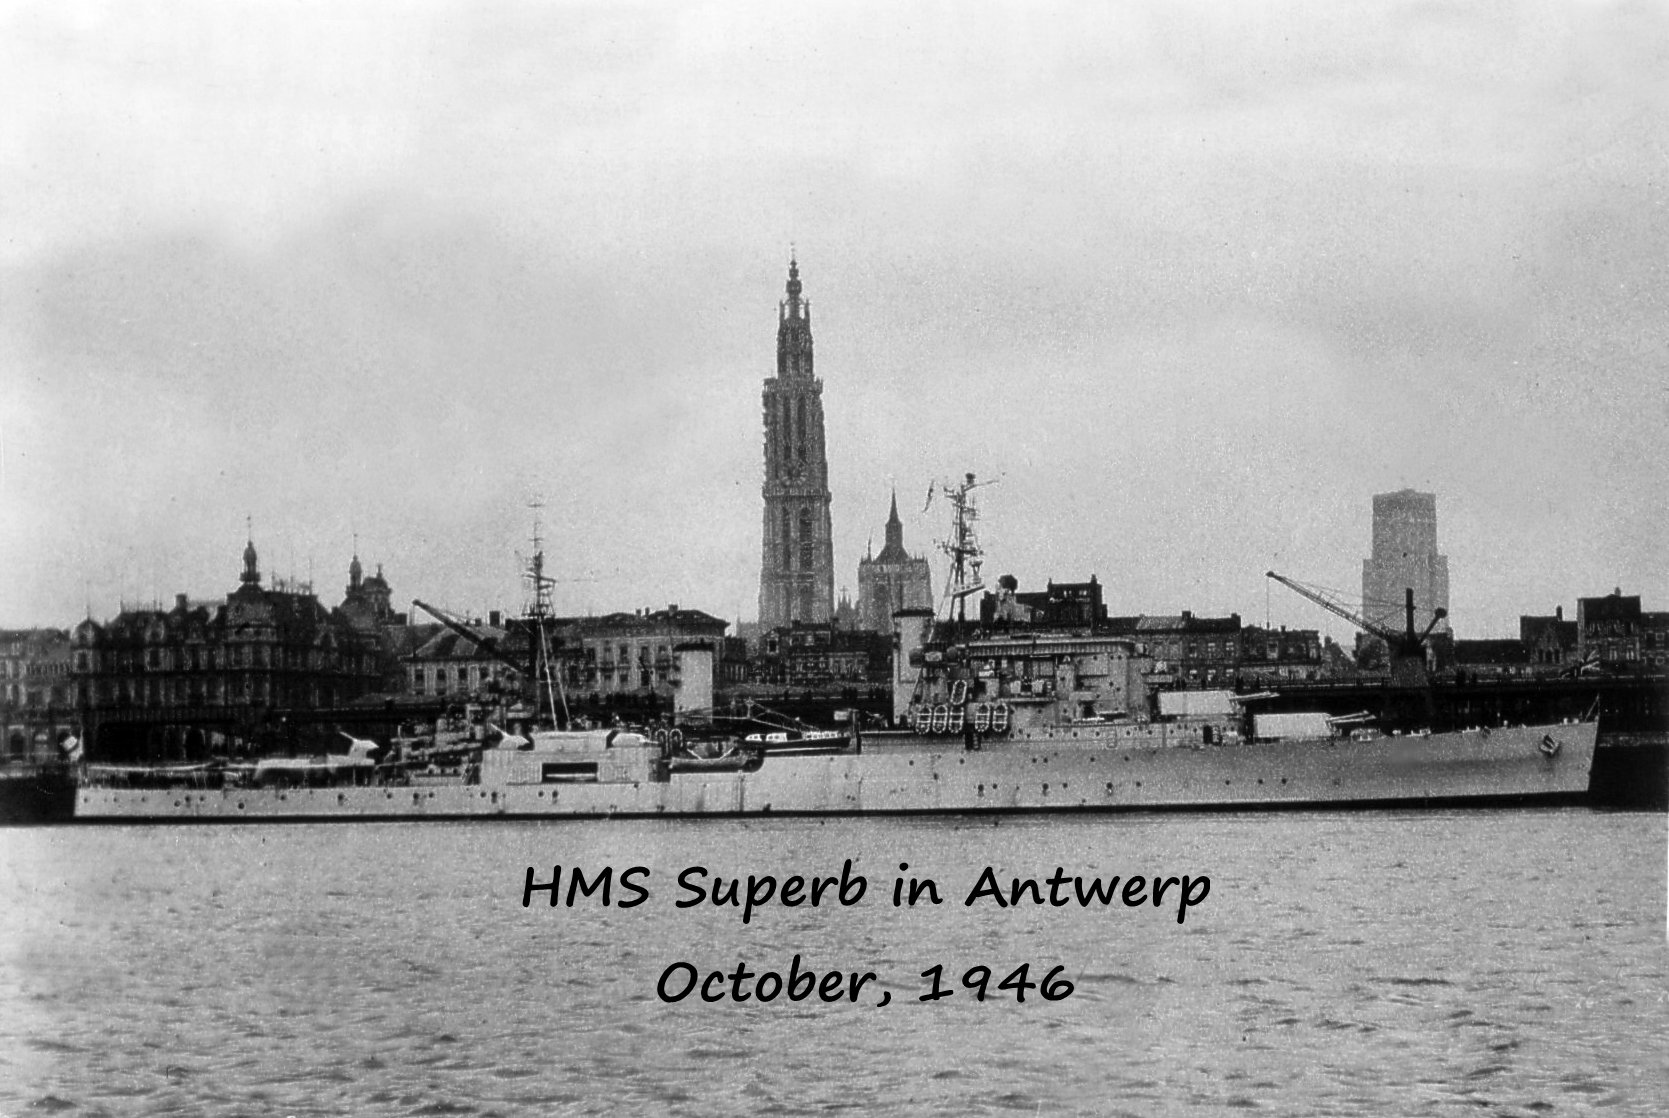 HMS Superb in Antwerp